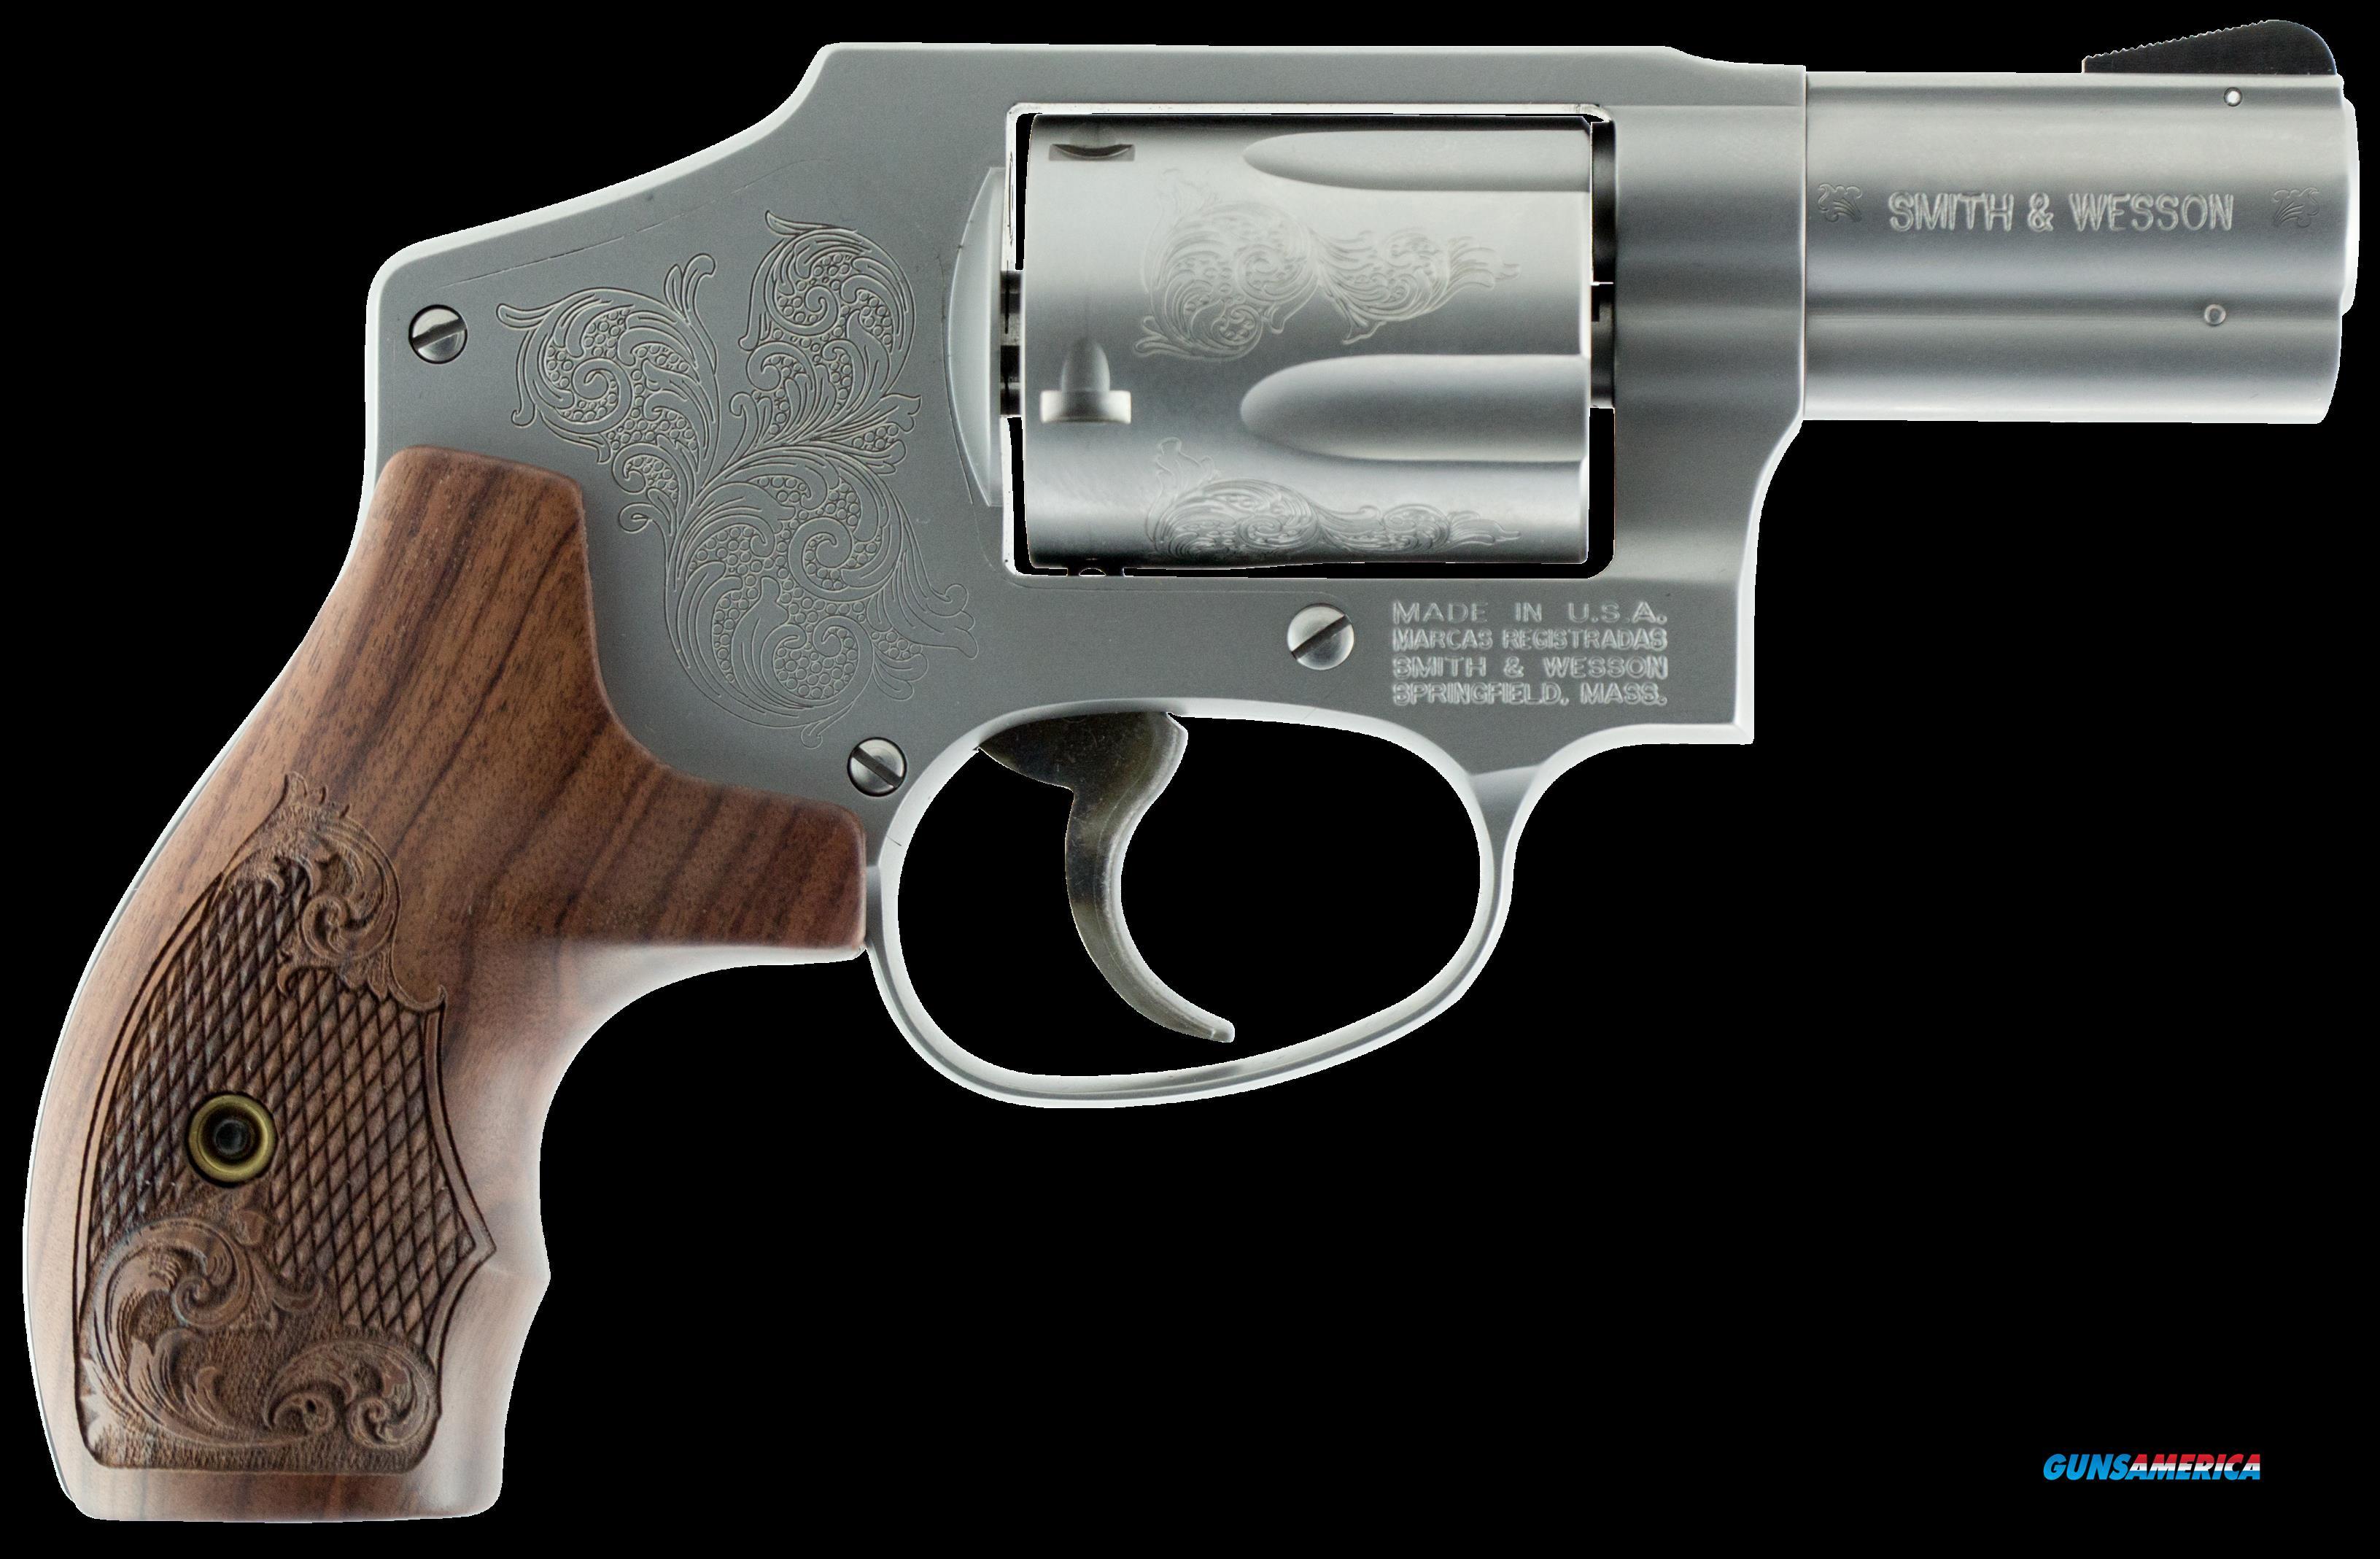 Smith & Wesson 640, S&w M640      150784 357 2 1-8 Engraved Ss  Guns > Pistols > 1911 Pistol Copies (non-Colt)